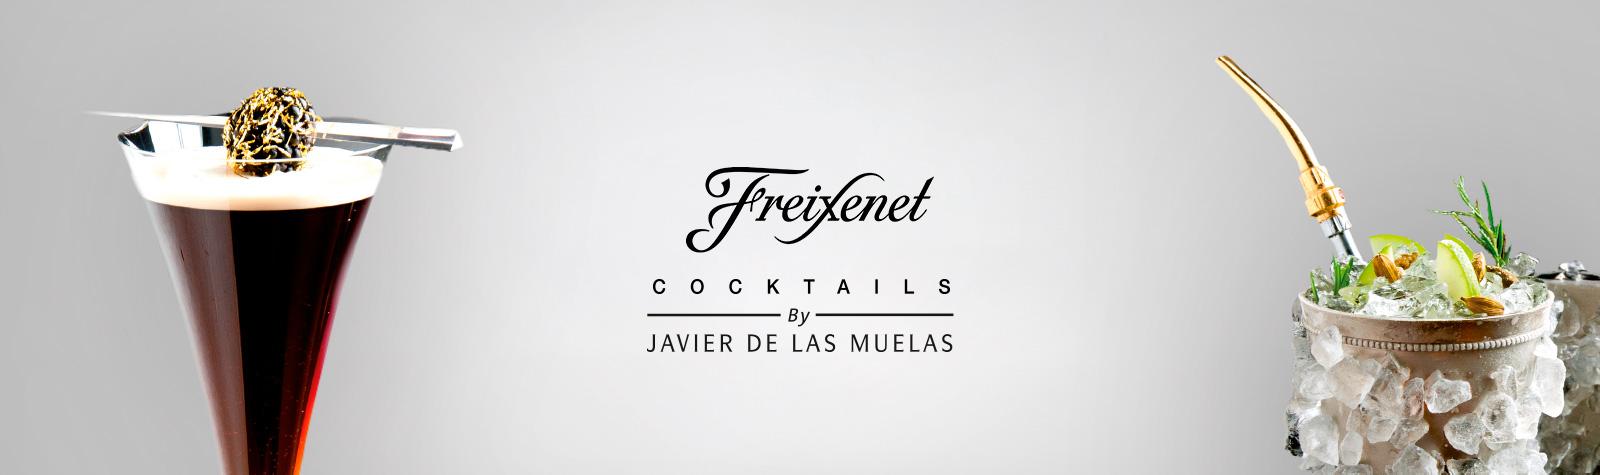 Background - COCKTAILS BY JAVIER DE LAS MUELAS